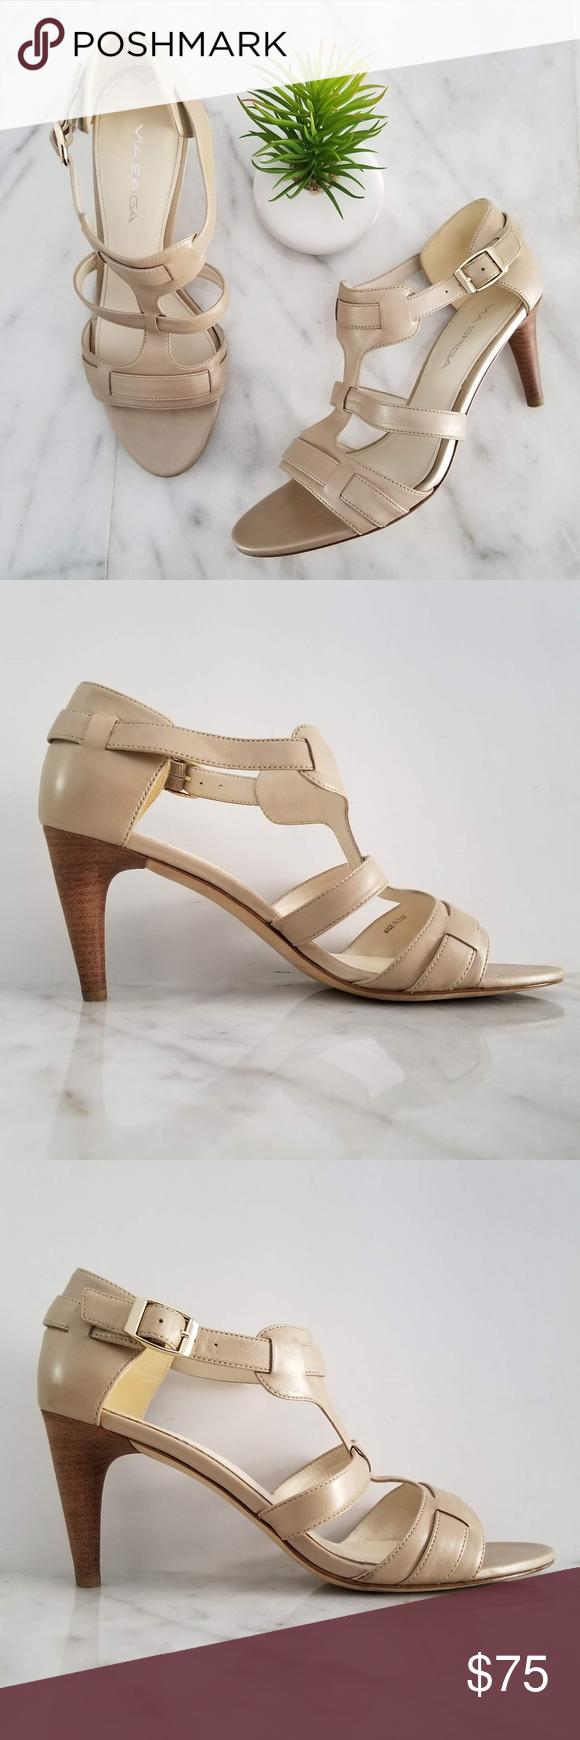 745abda62c0 VIA SPIGA Hilda Sandal Ankle Strap Pearl Heels VIA SPIGA Hilda Sandal  Platinum Pearl Leather Uppers